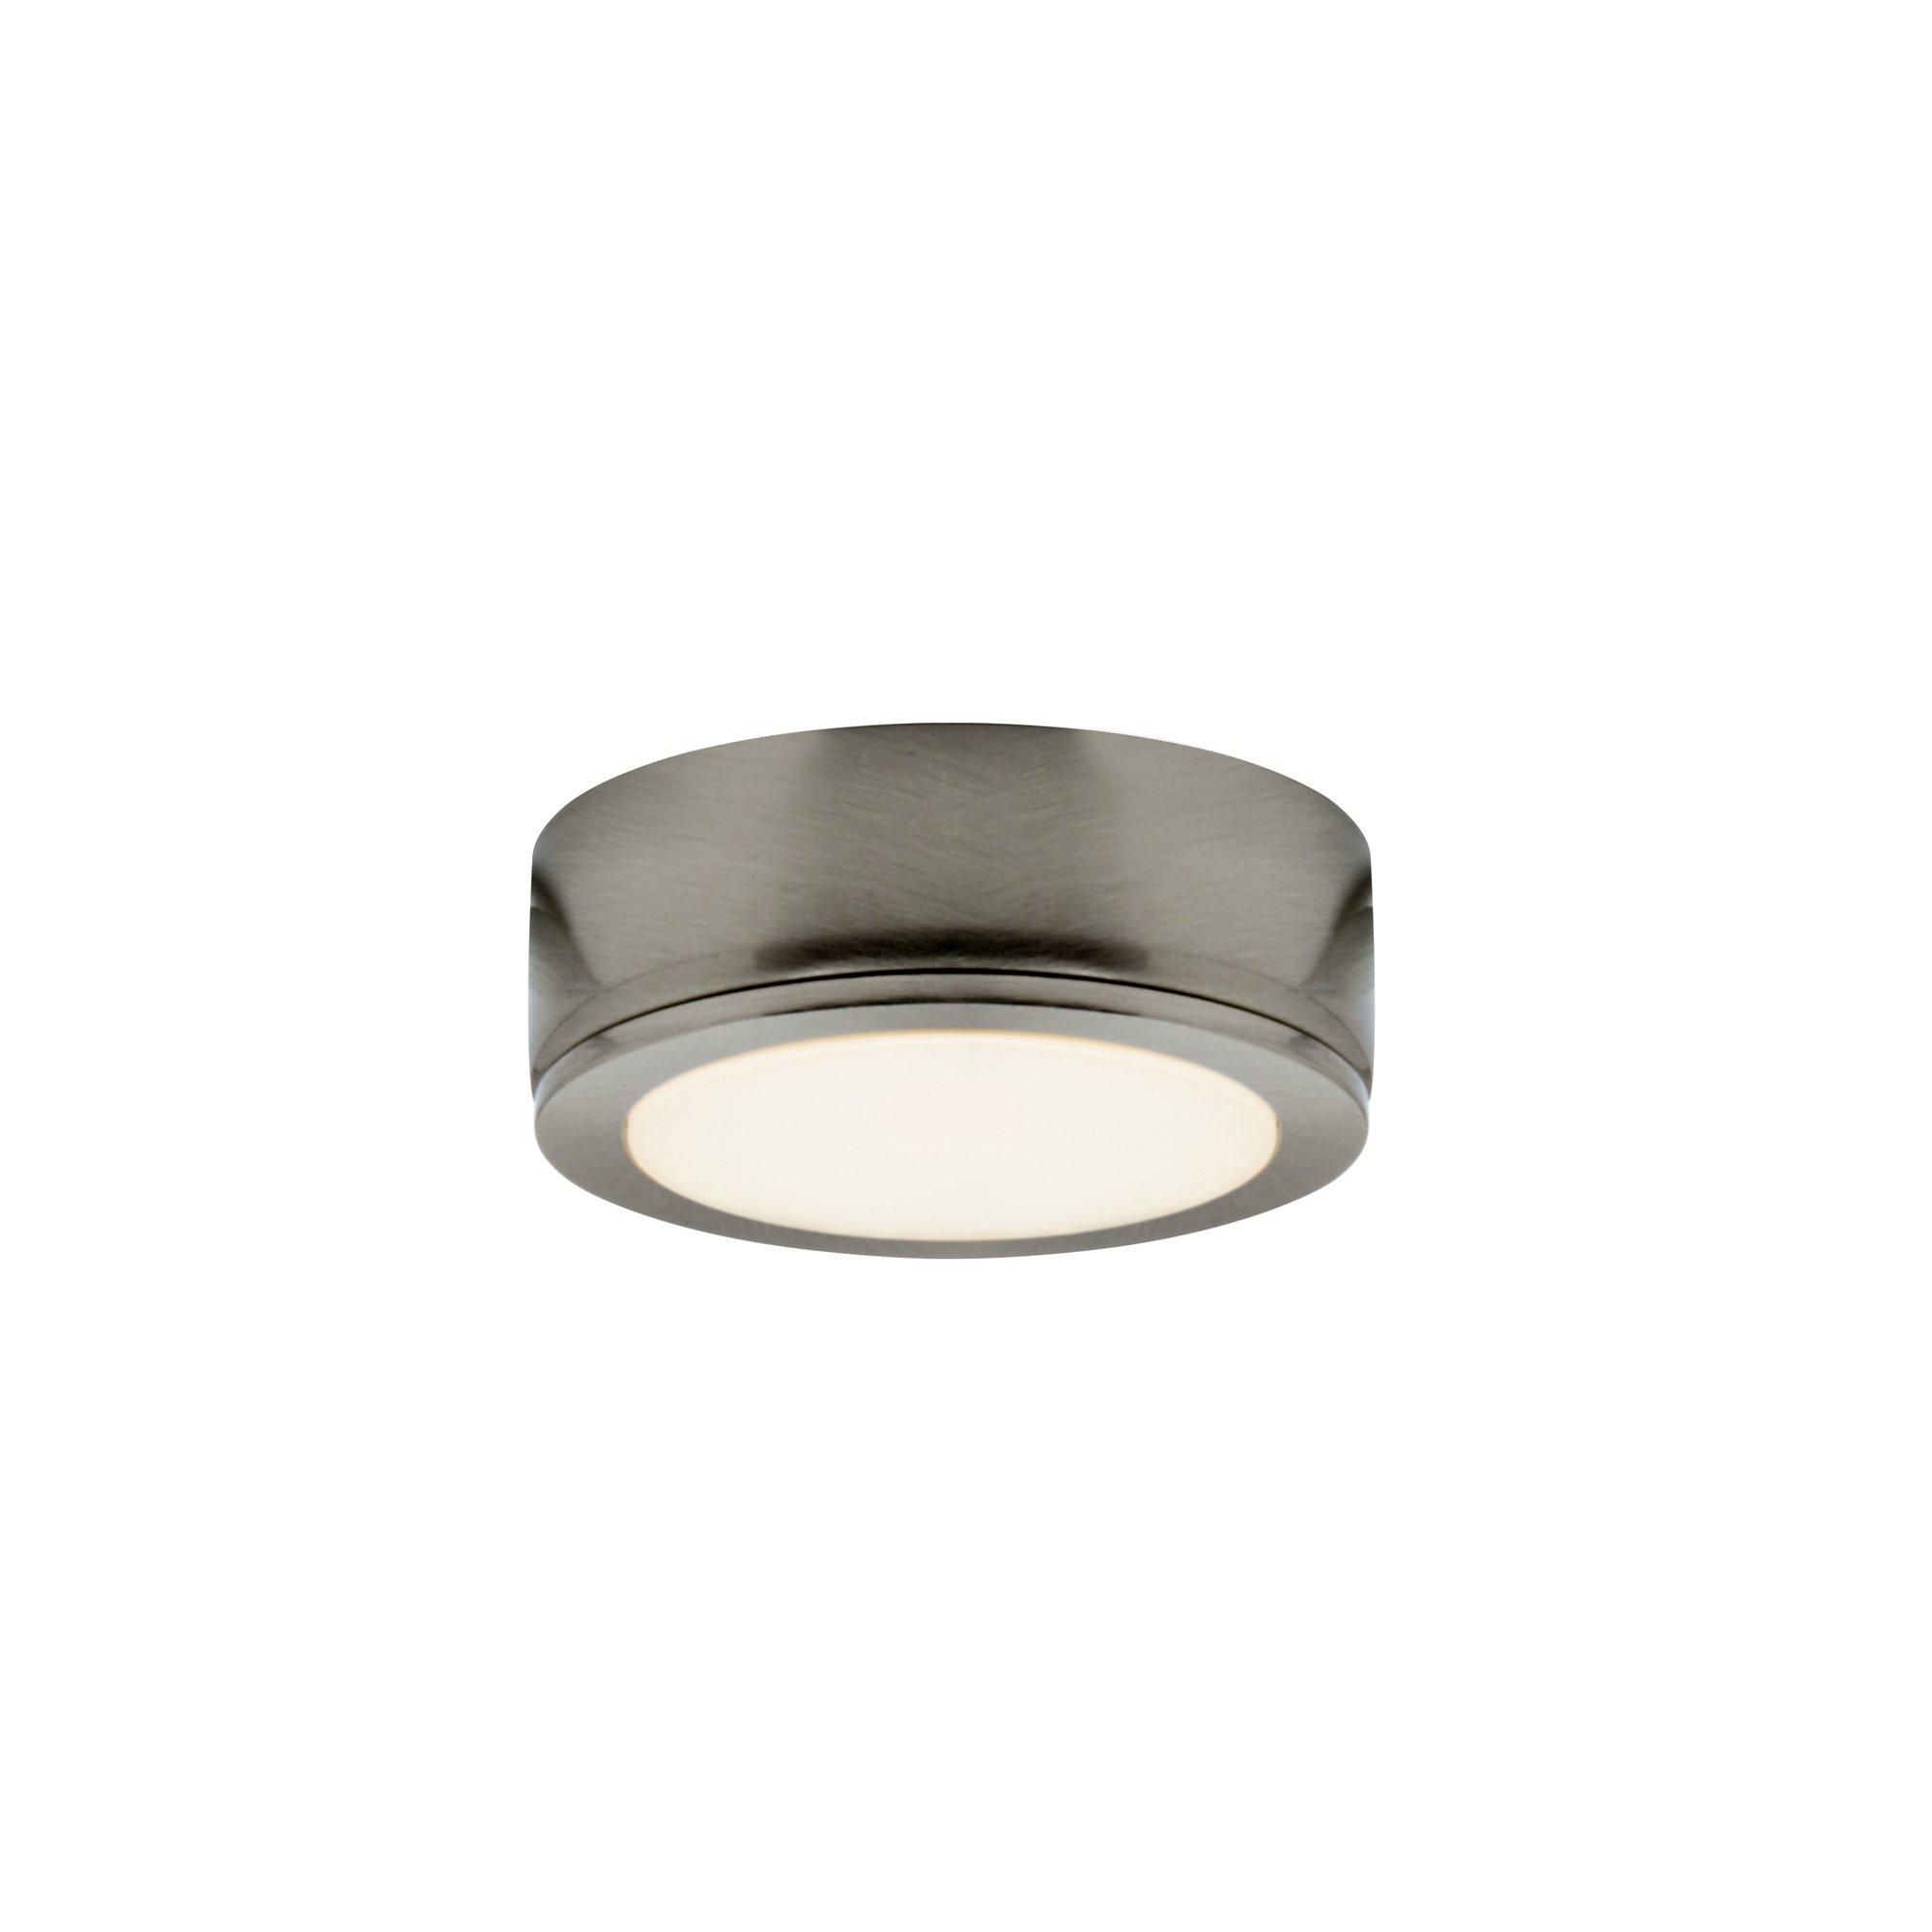 DALS Lighting 6001-SN 2.75'' Power LED Under Cabinet Puck Light, Satin Nickel